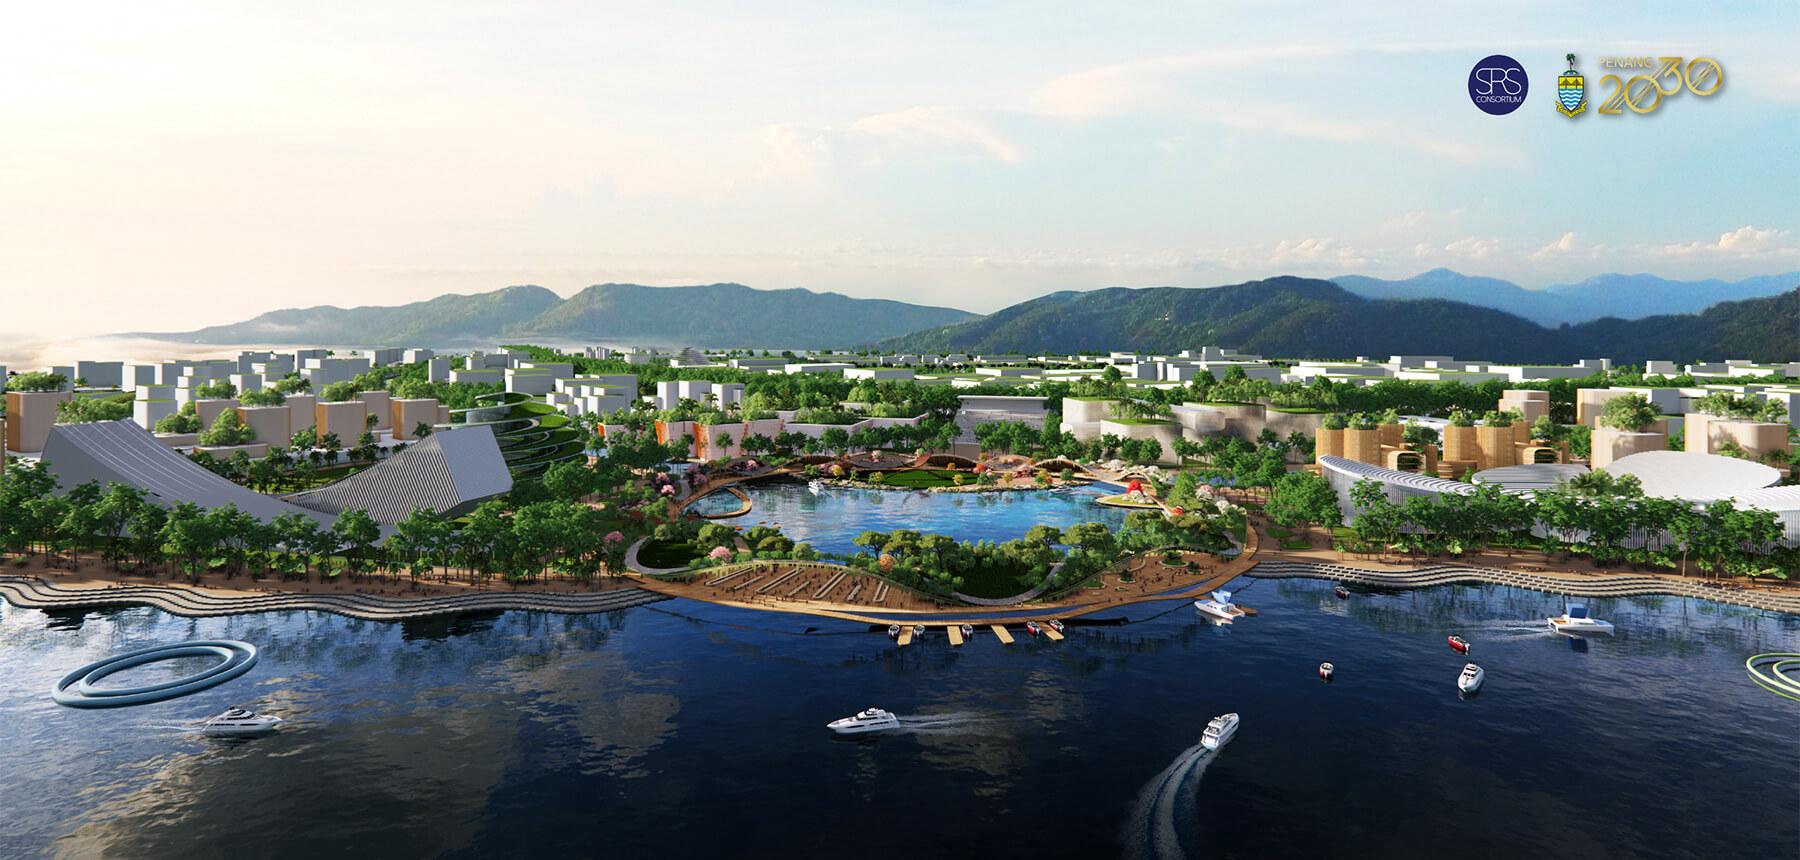 Penang South Island